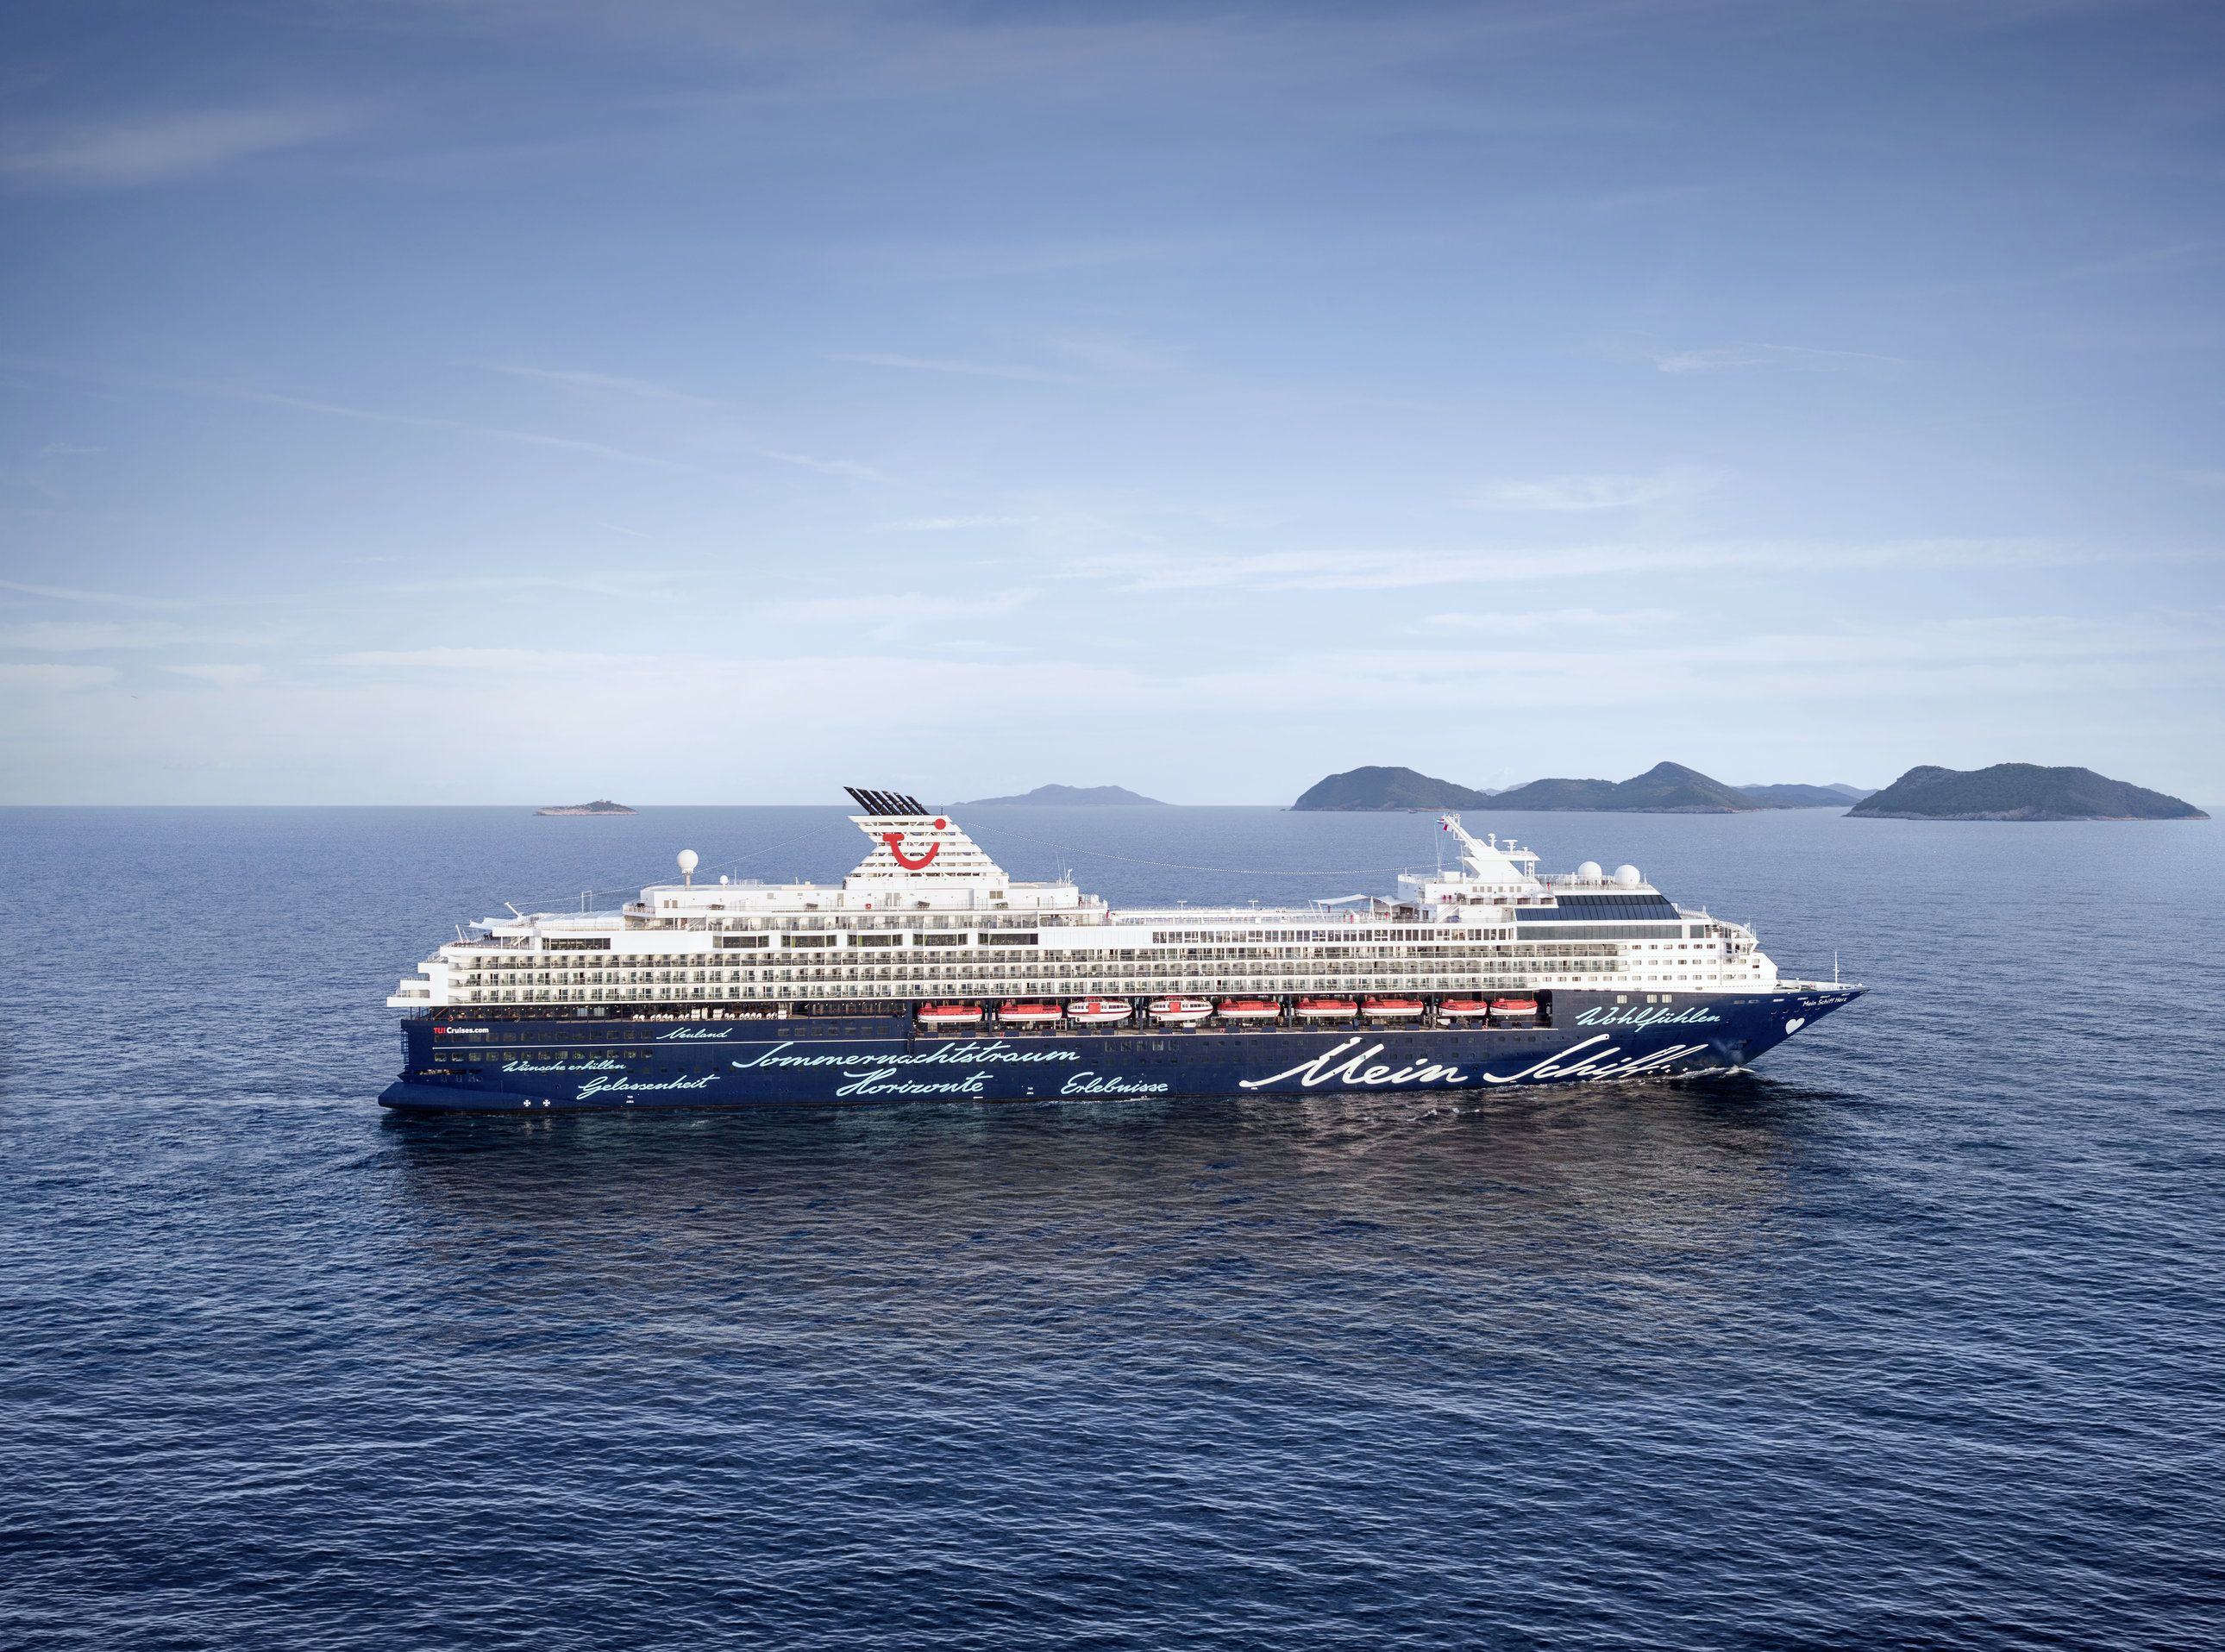 TUI Cruises - Mein Schiff Herz